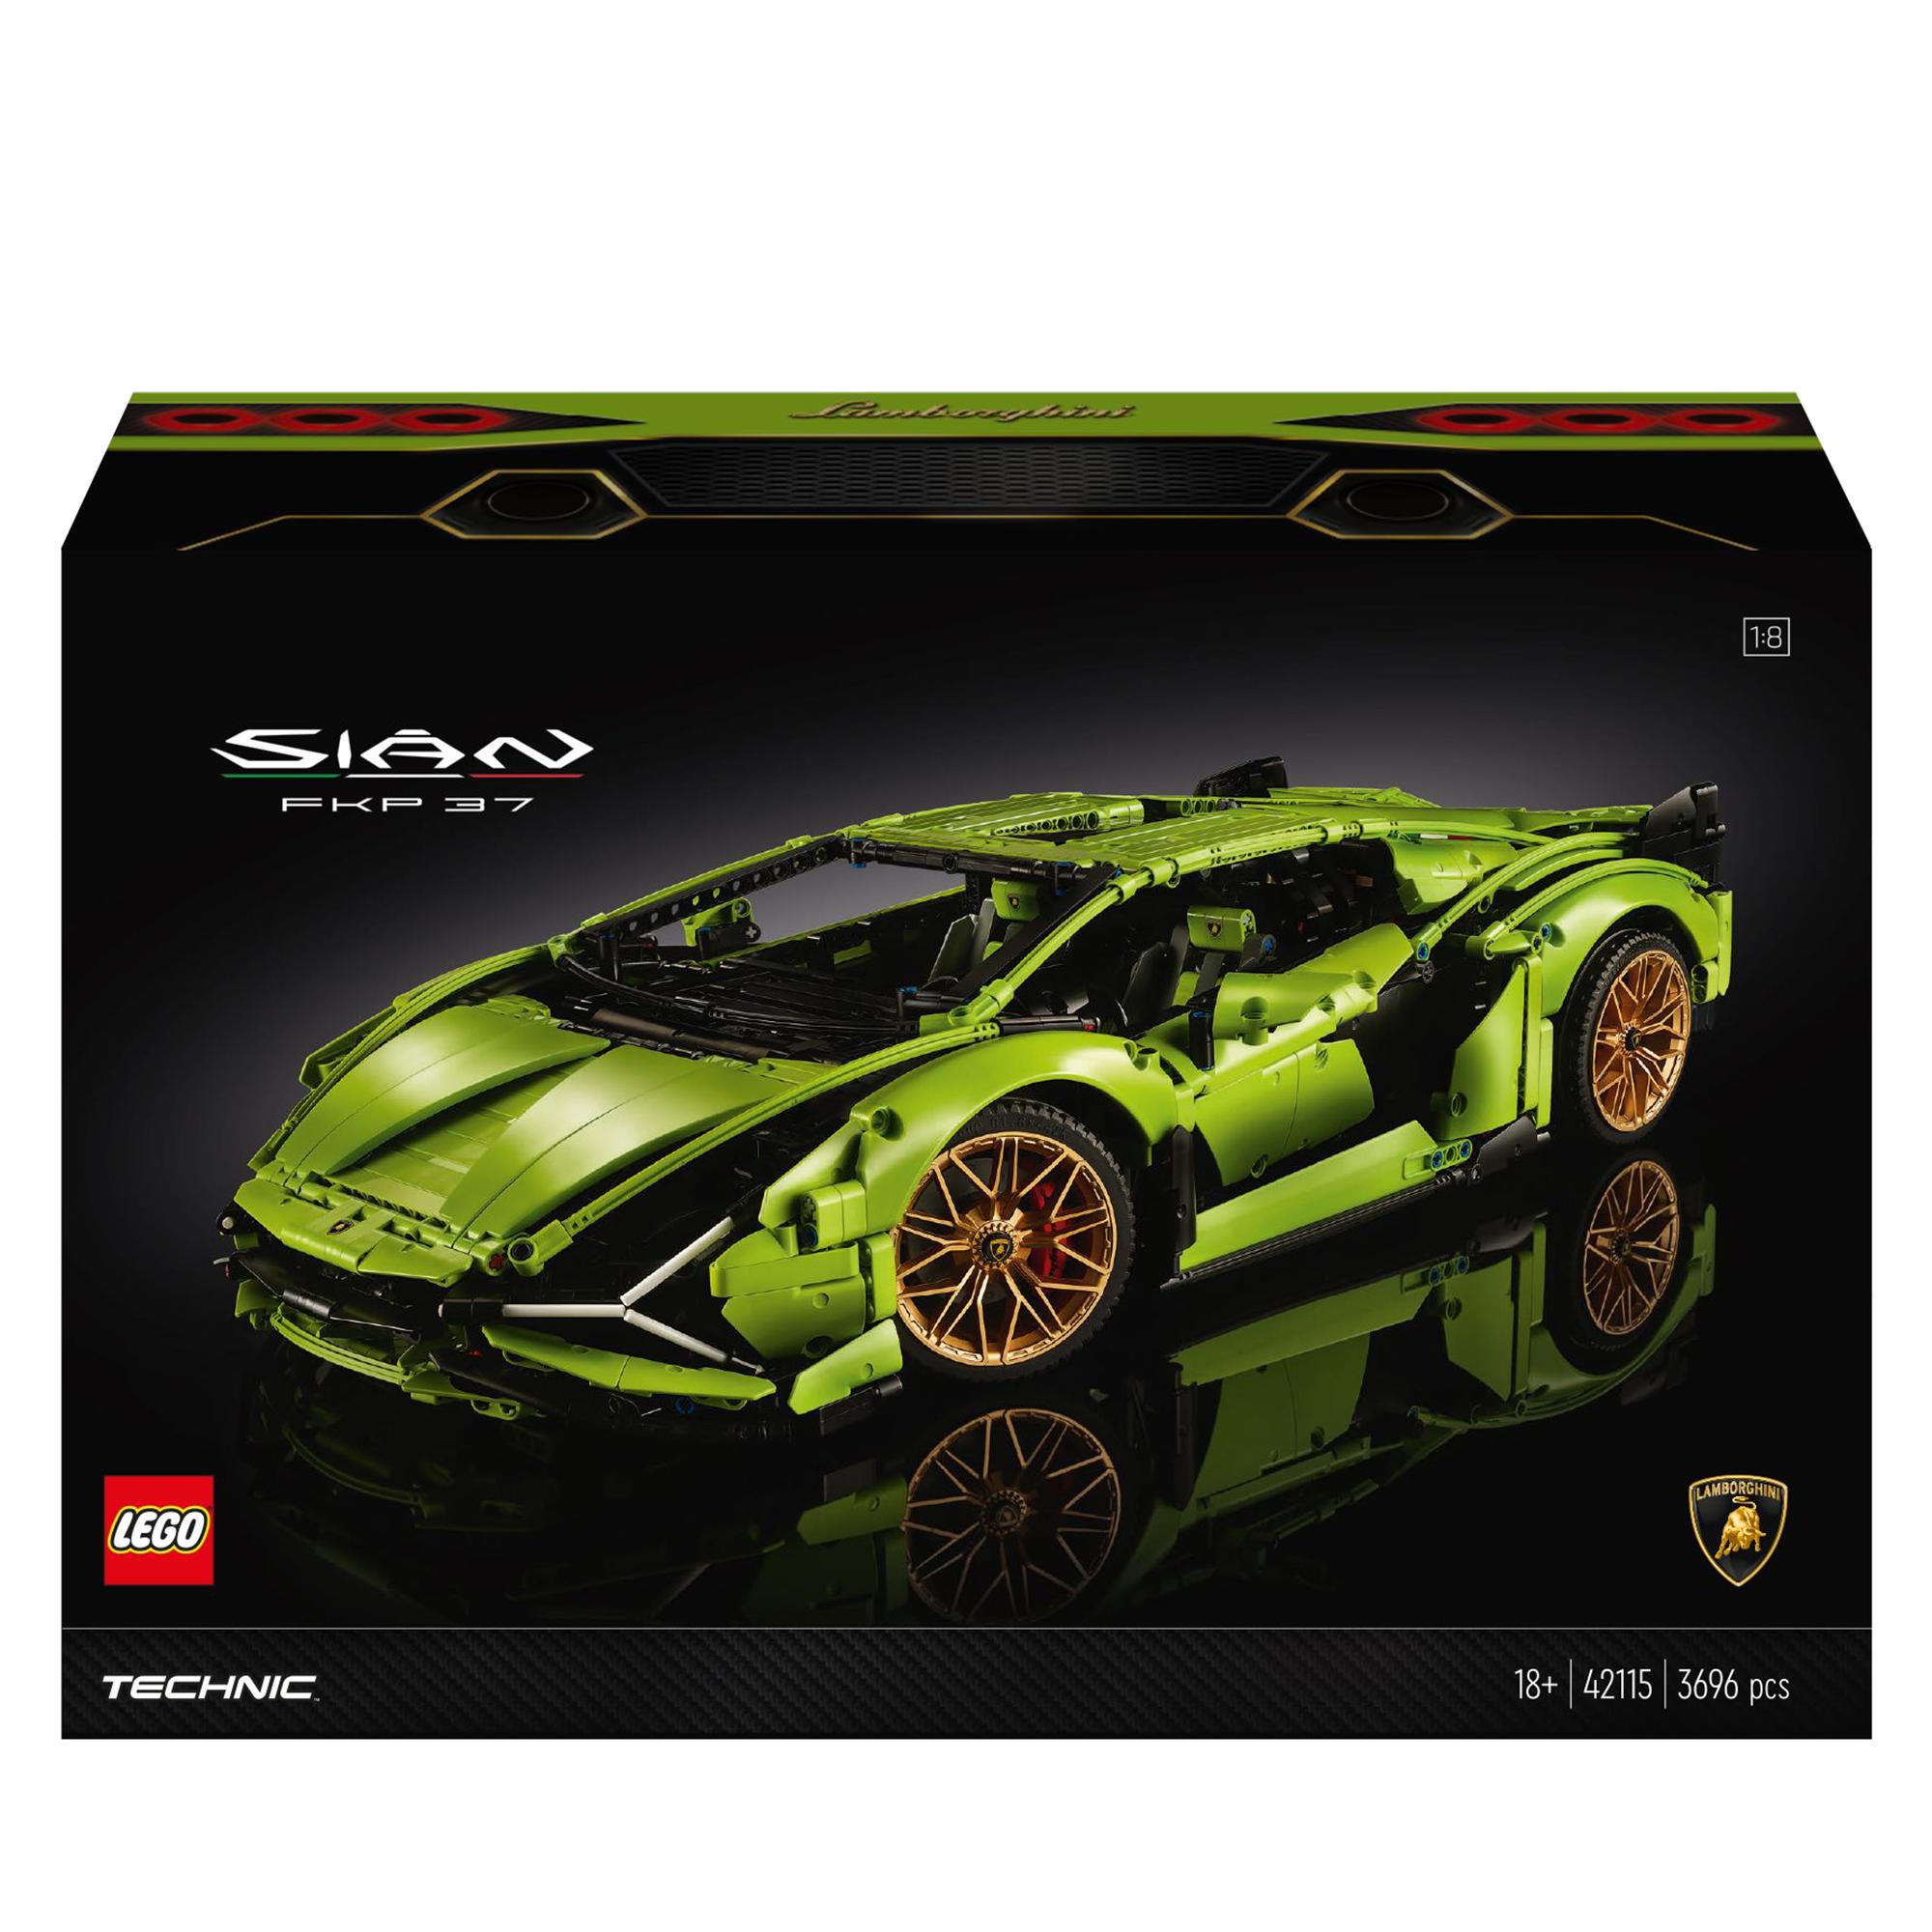 Lego technic lamborghini sián fkp 37 - 42115 - LEGO TECHNIC, TECHNIC